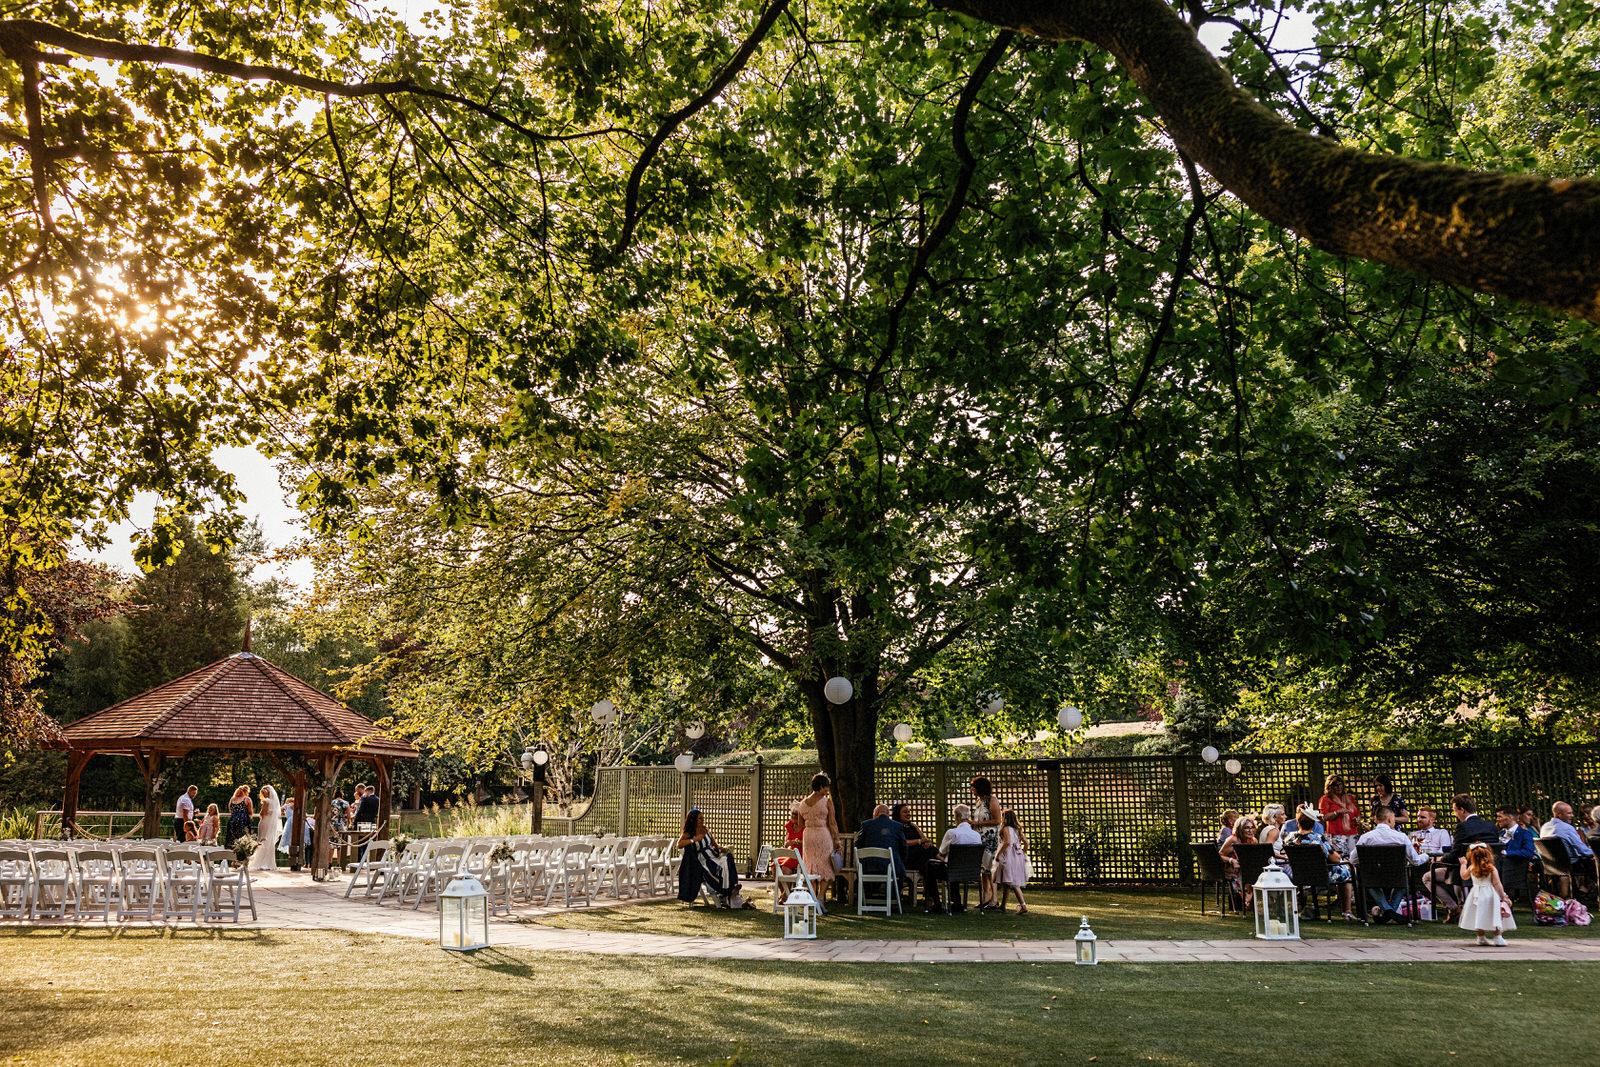 Moddershall-Oaks-Spa-Wedding-Photographer-062.jpg